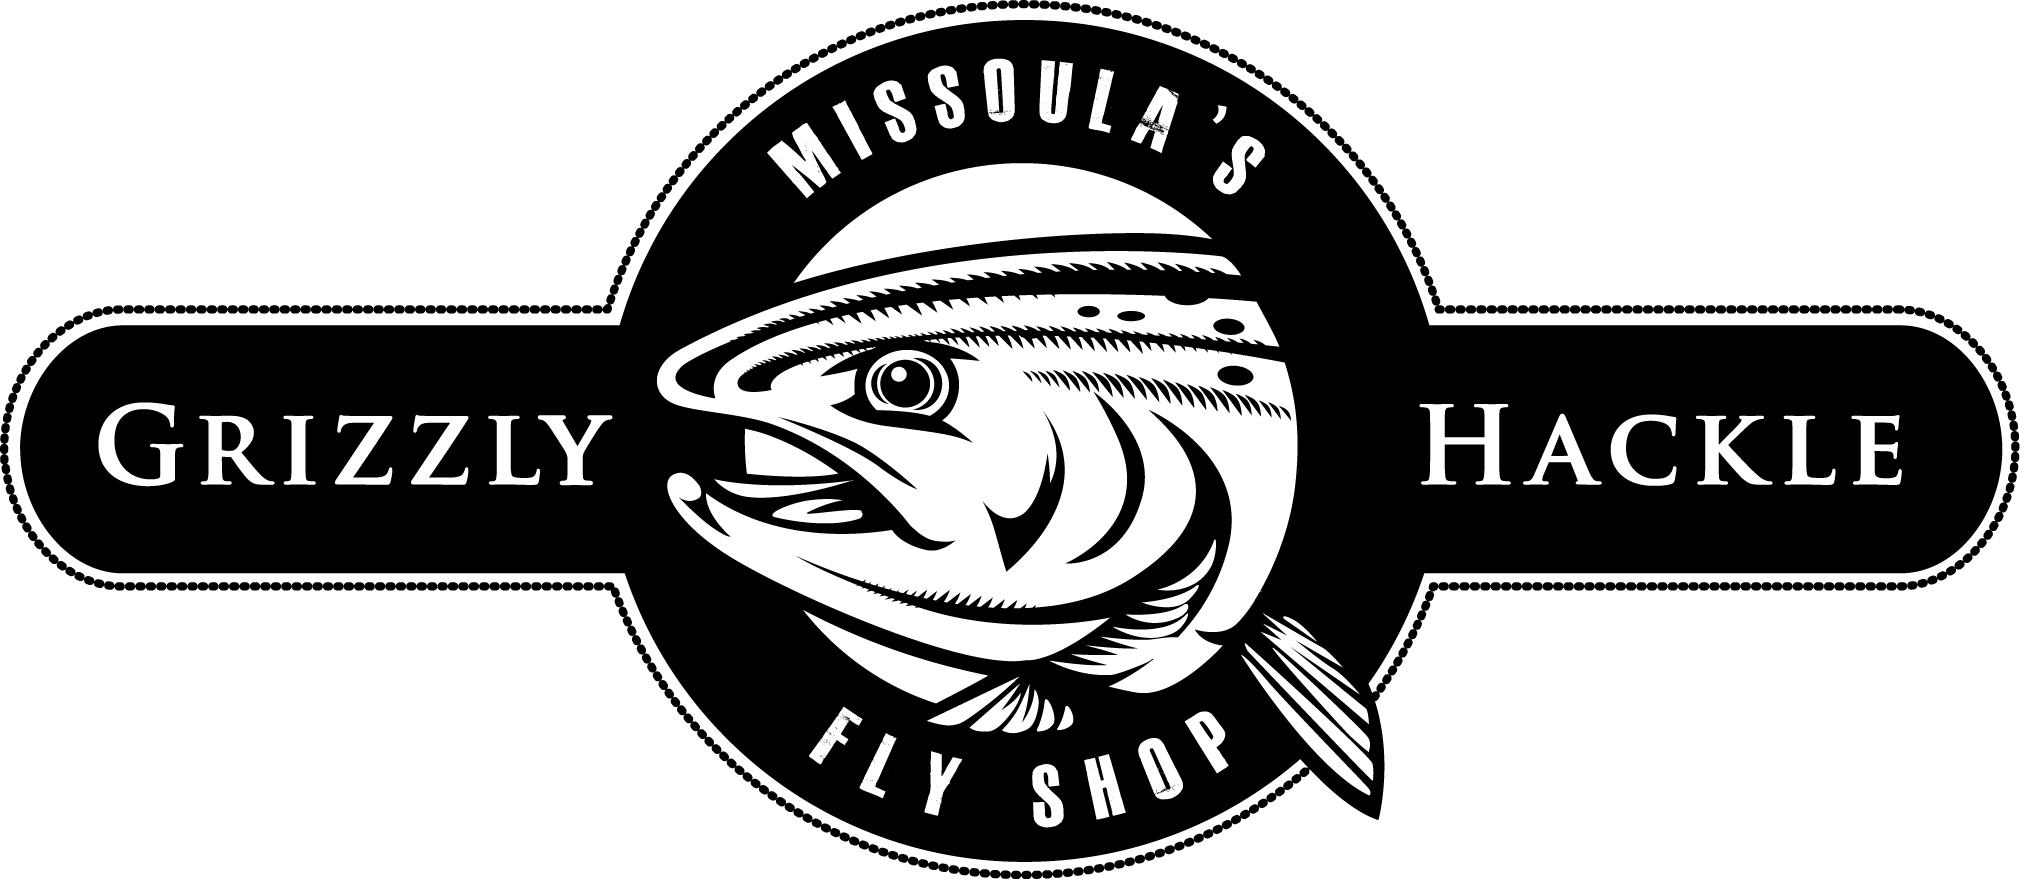 Missoula's Grizzly Hackle Logo.jpg